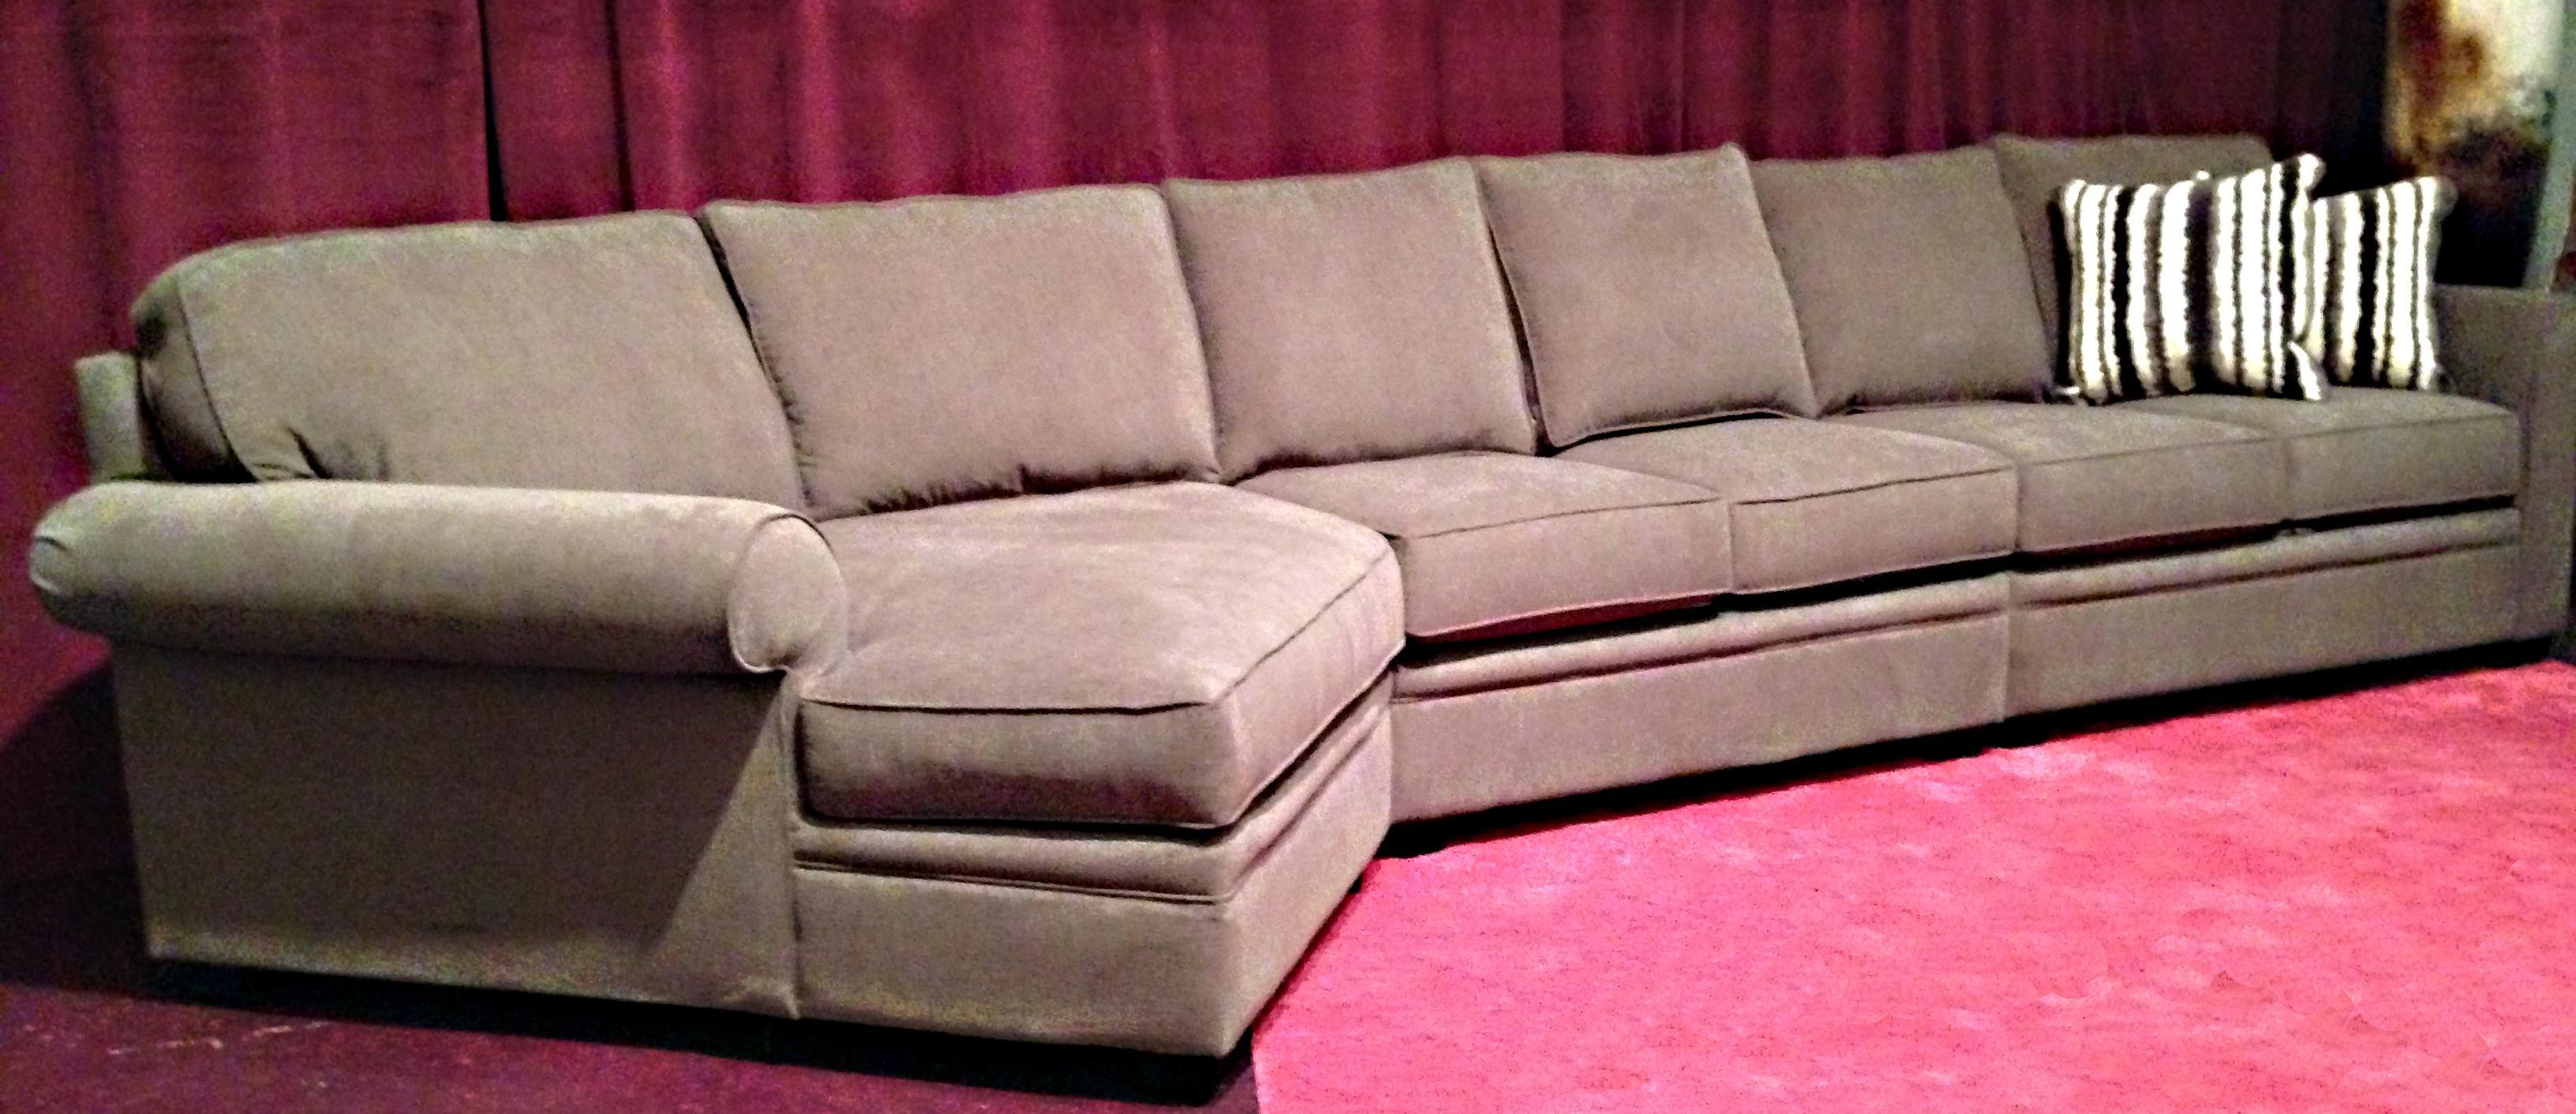 sofa cushions online canada fabric india 20 ideas of deep cushion